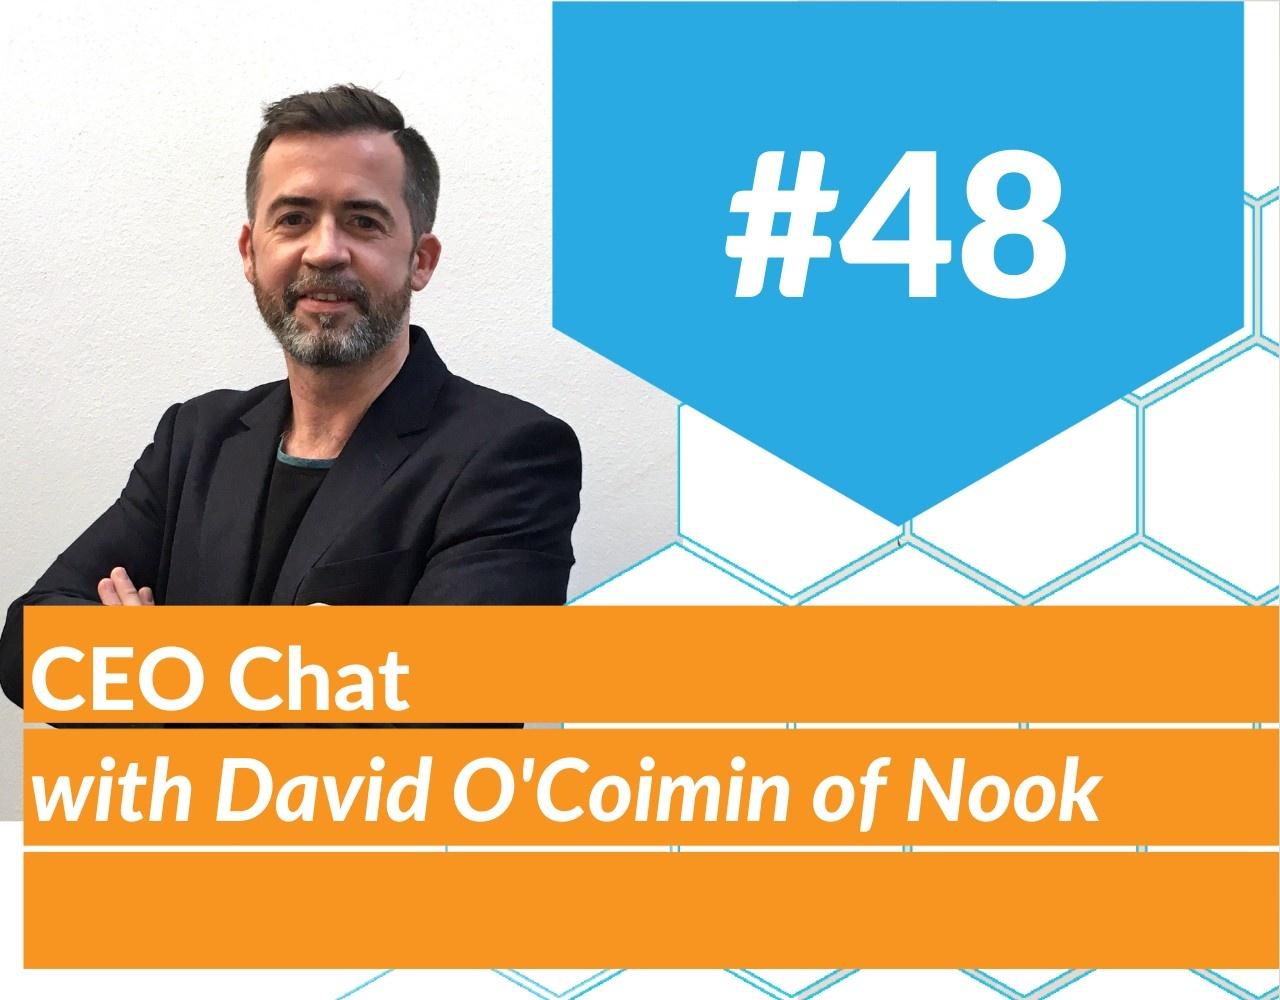 CEO-chat-with-david-ocoimin-nook